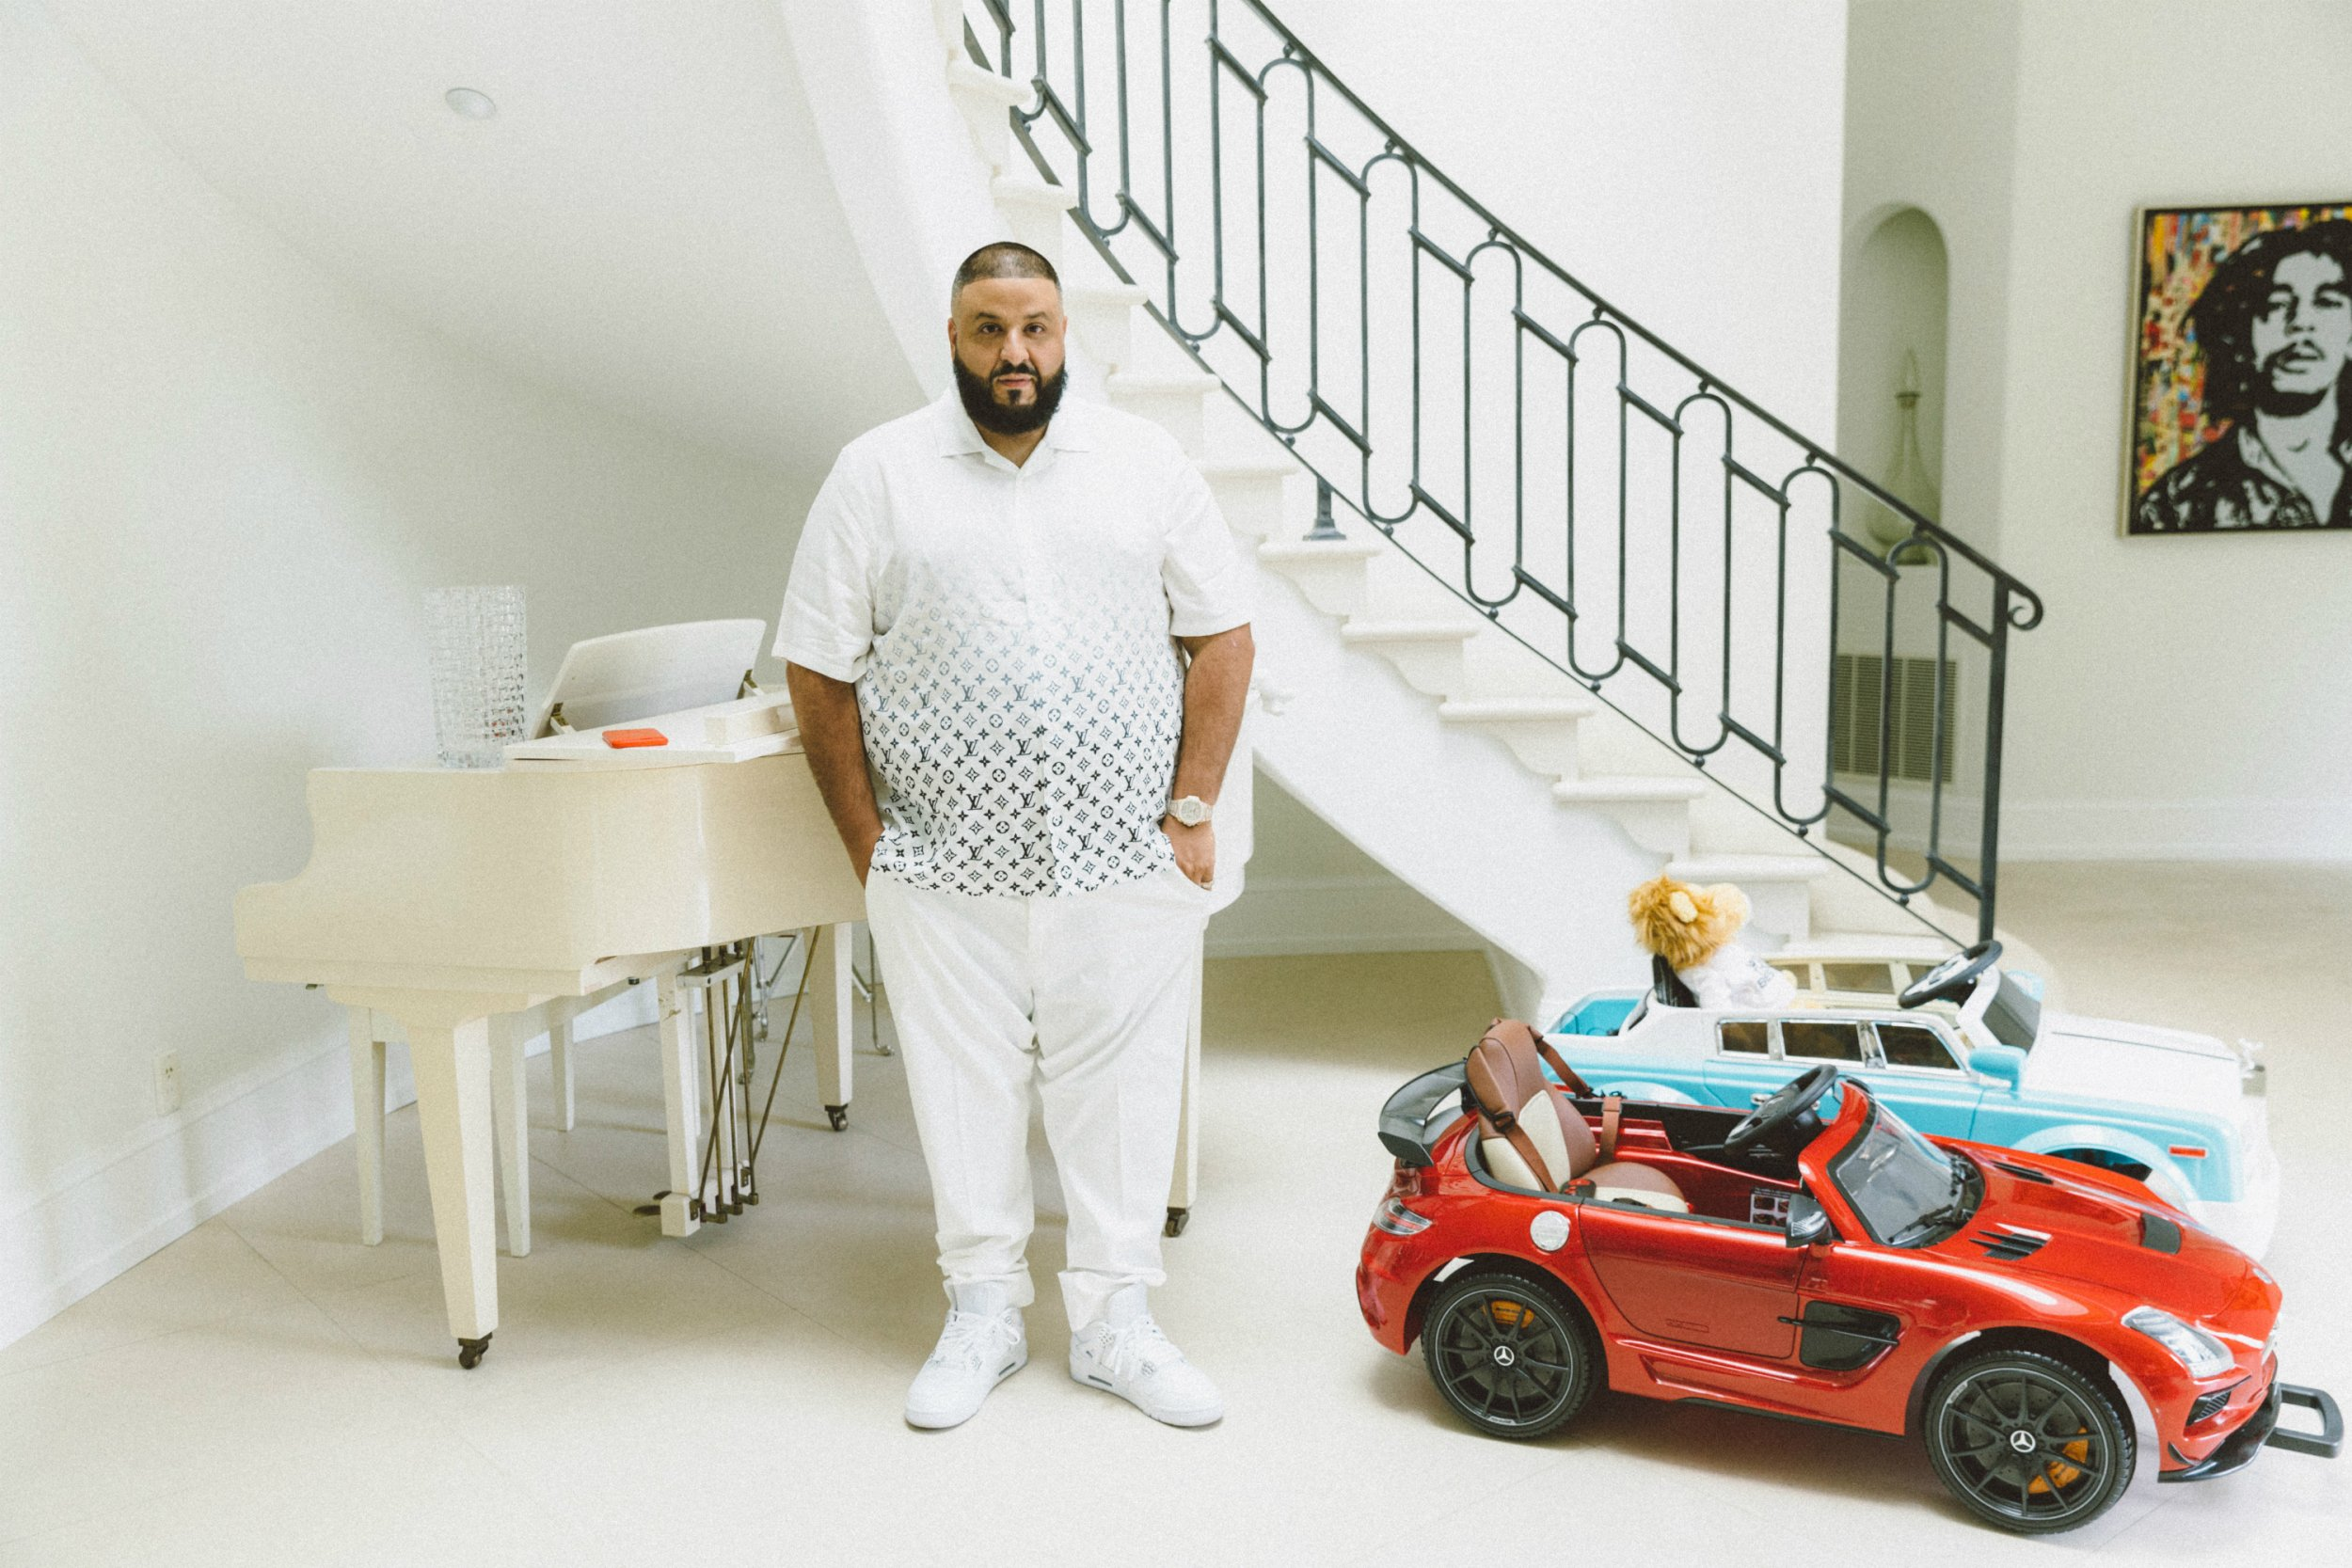 DJ Khaled for Newsweek